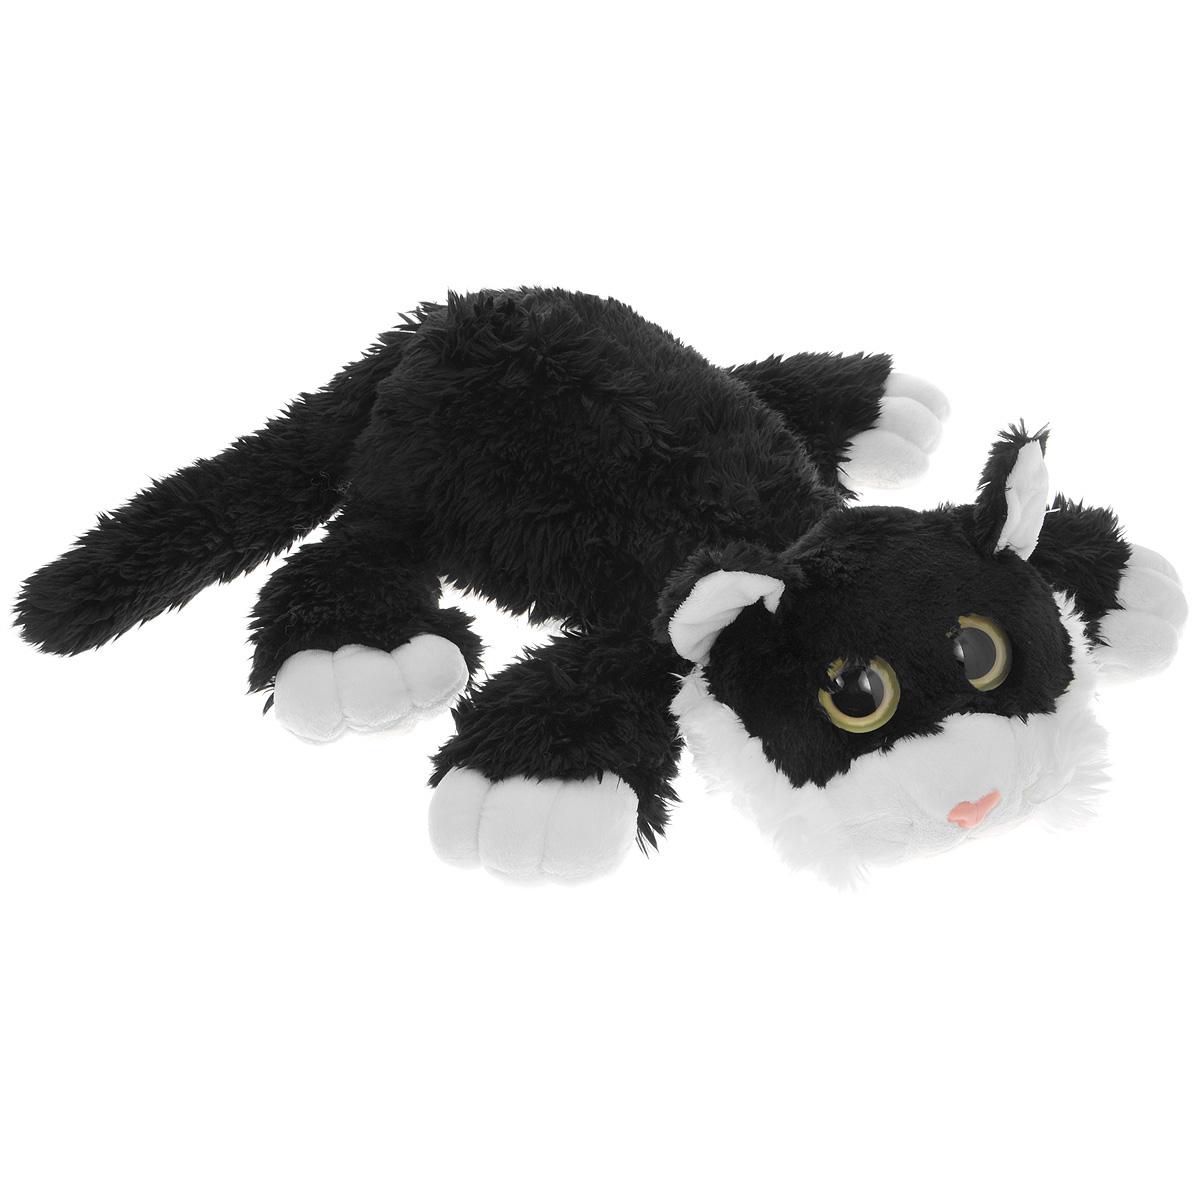 Gulliver Мягкая игрушка Котик Шалунишка, 30 см игрушка collecta котик шалунишка 18 3001 1